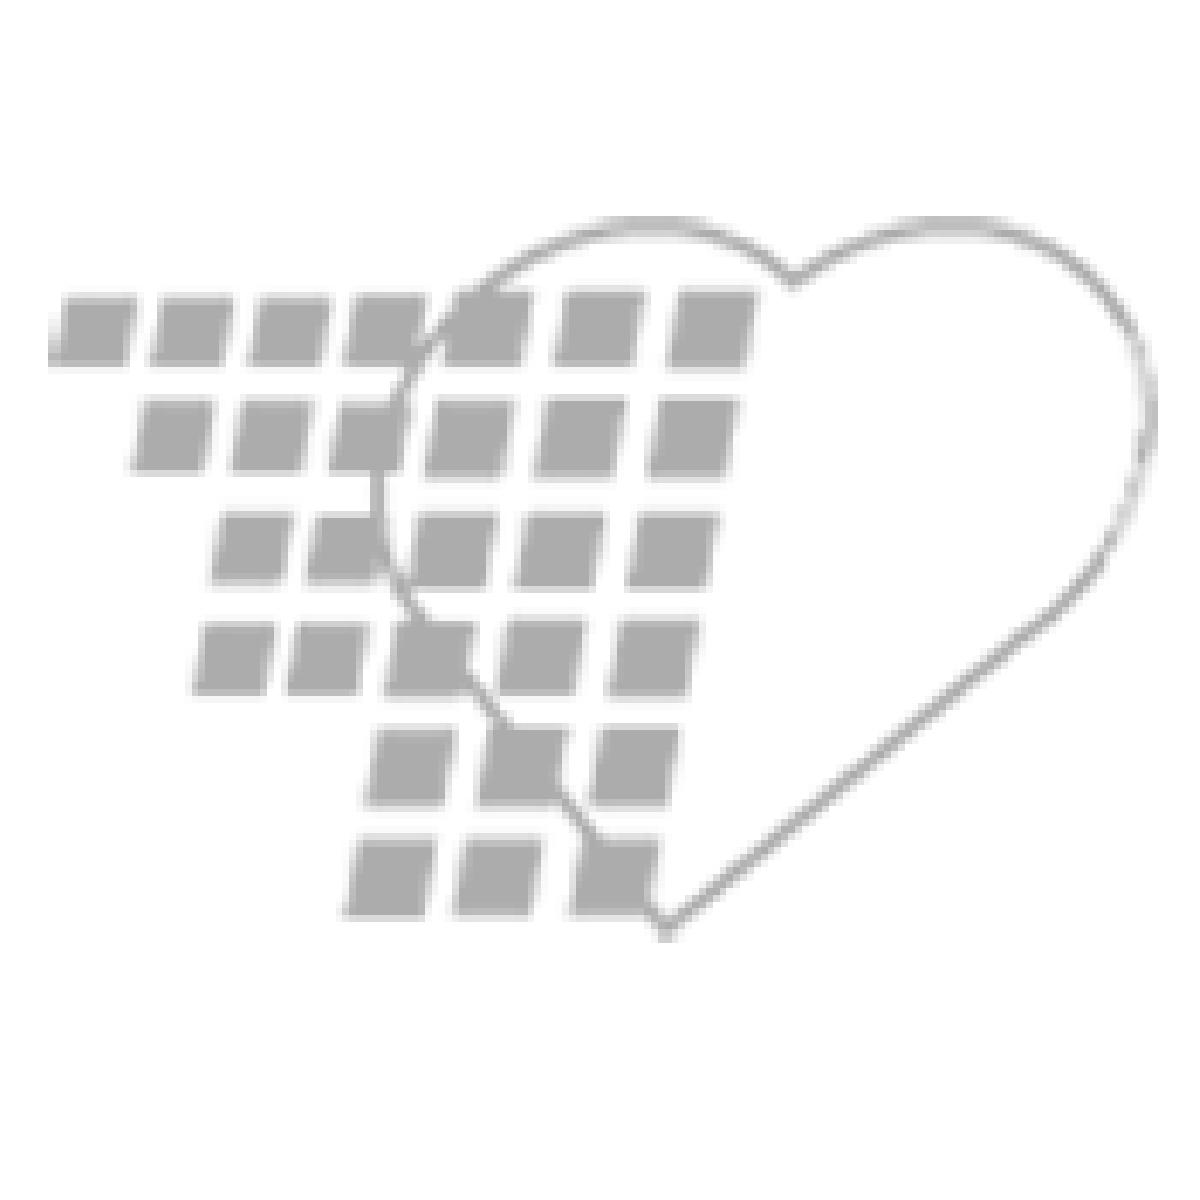 06-82-3801 ChemoPlus™ Vial Vent Chemo Dispensing Pin